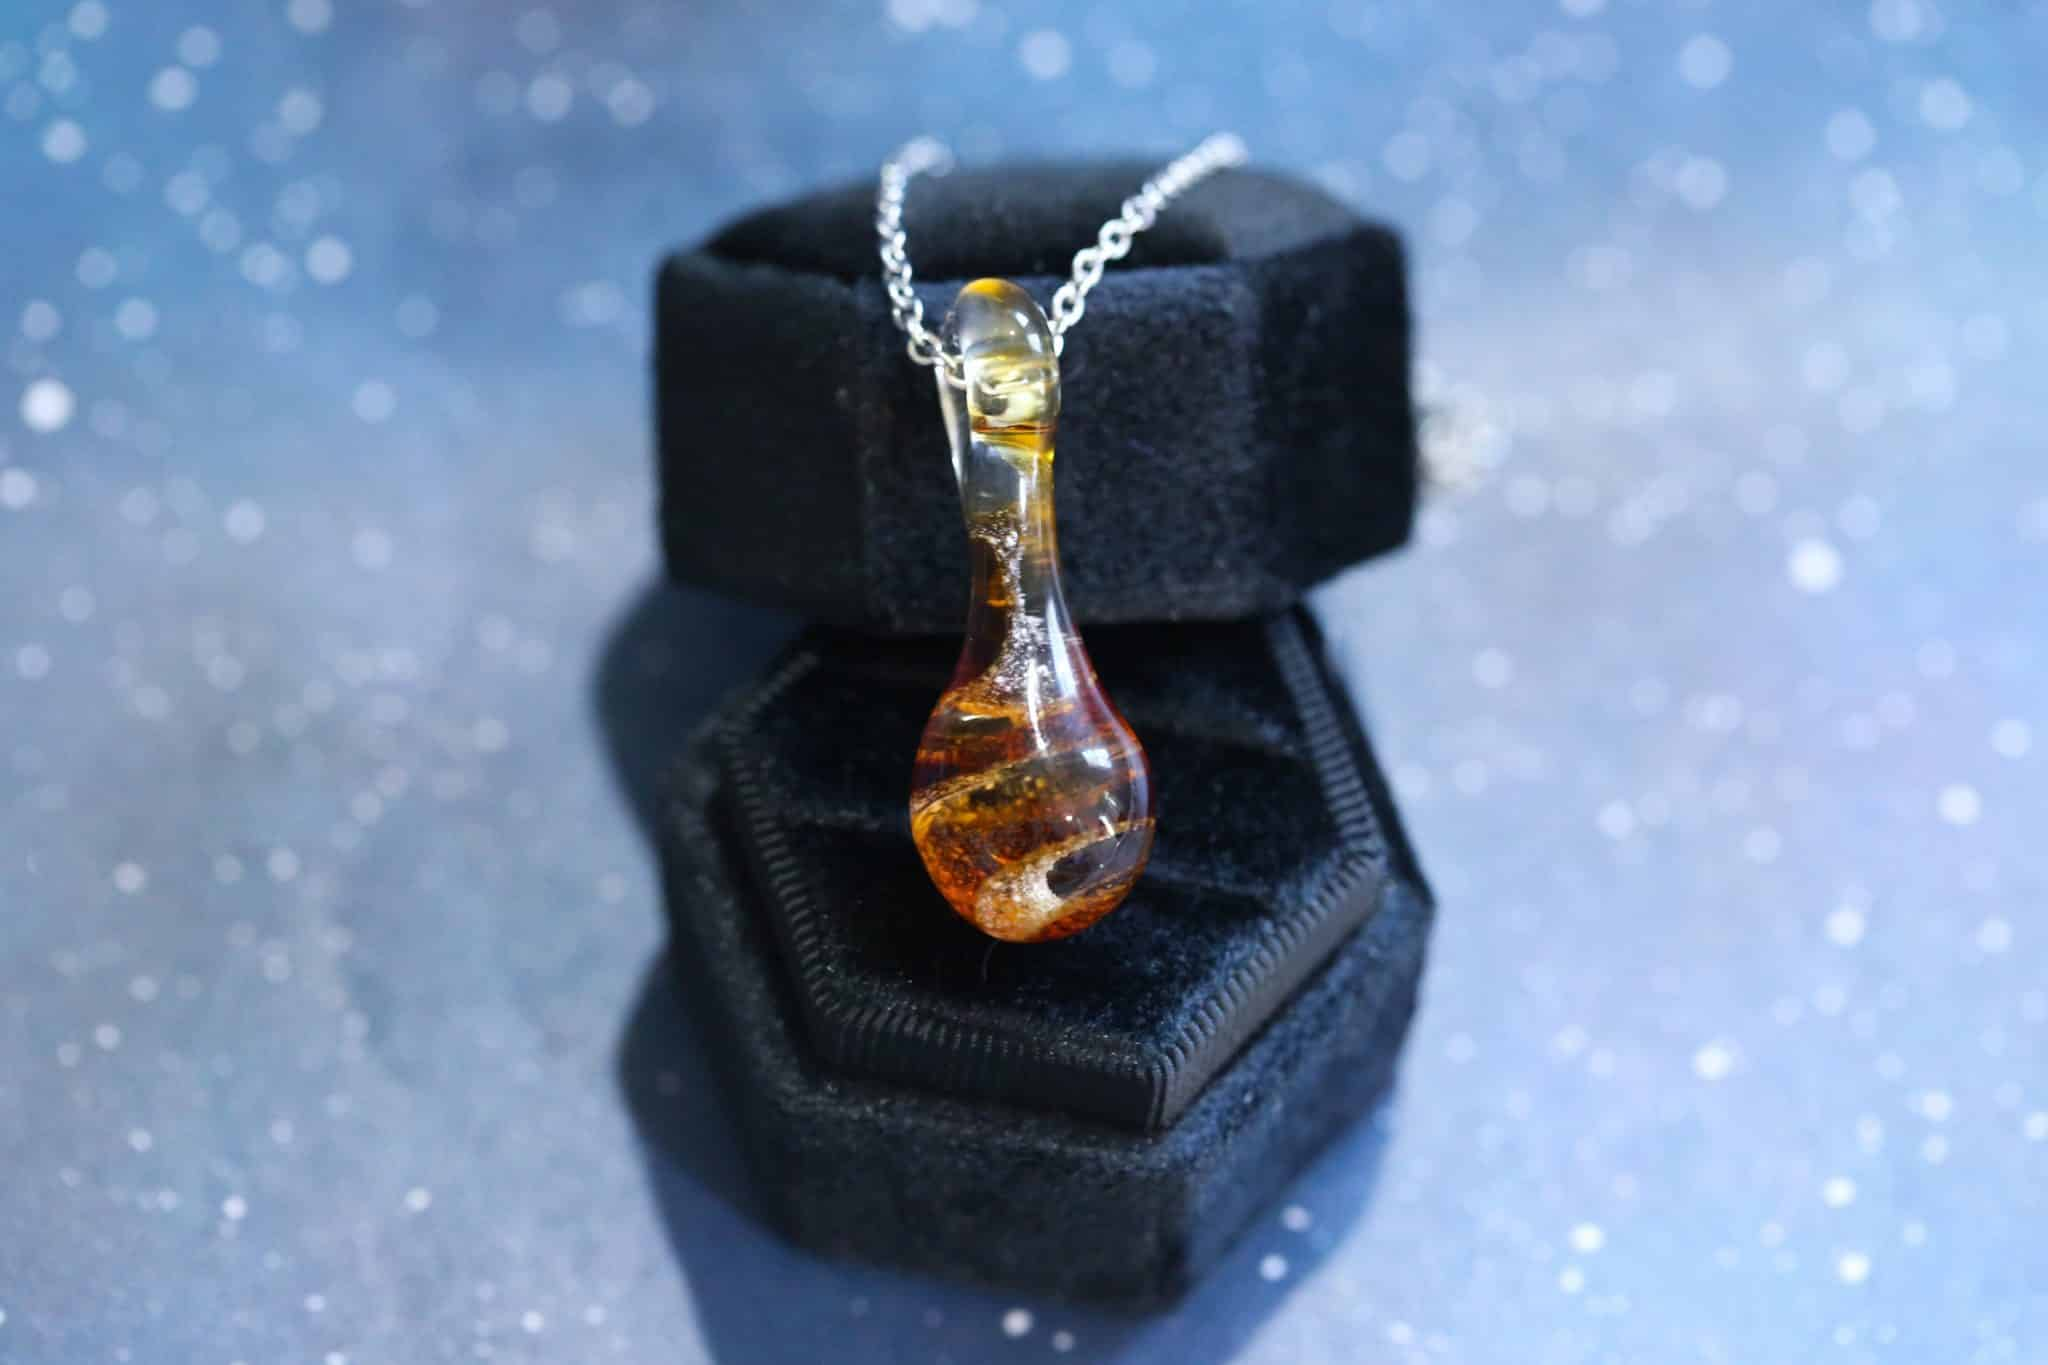 Beaded Jewelry Custom Made Memorial Pendant Cremation Jewelry Memorial Jewelry *You fill option Urn Pendant Cremation Pendant